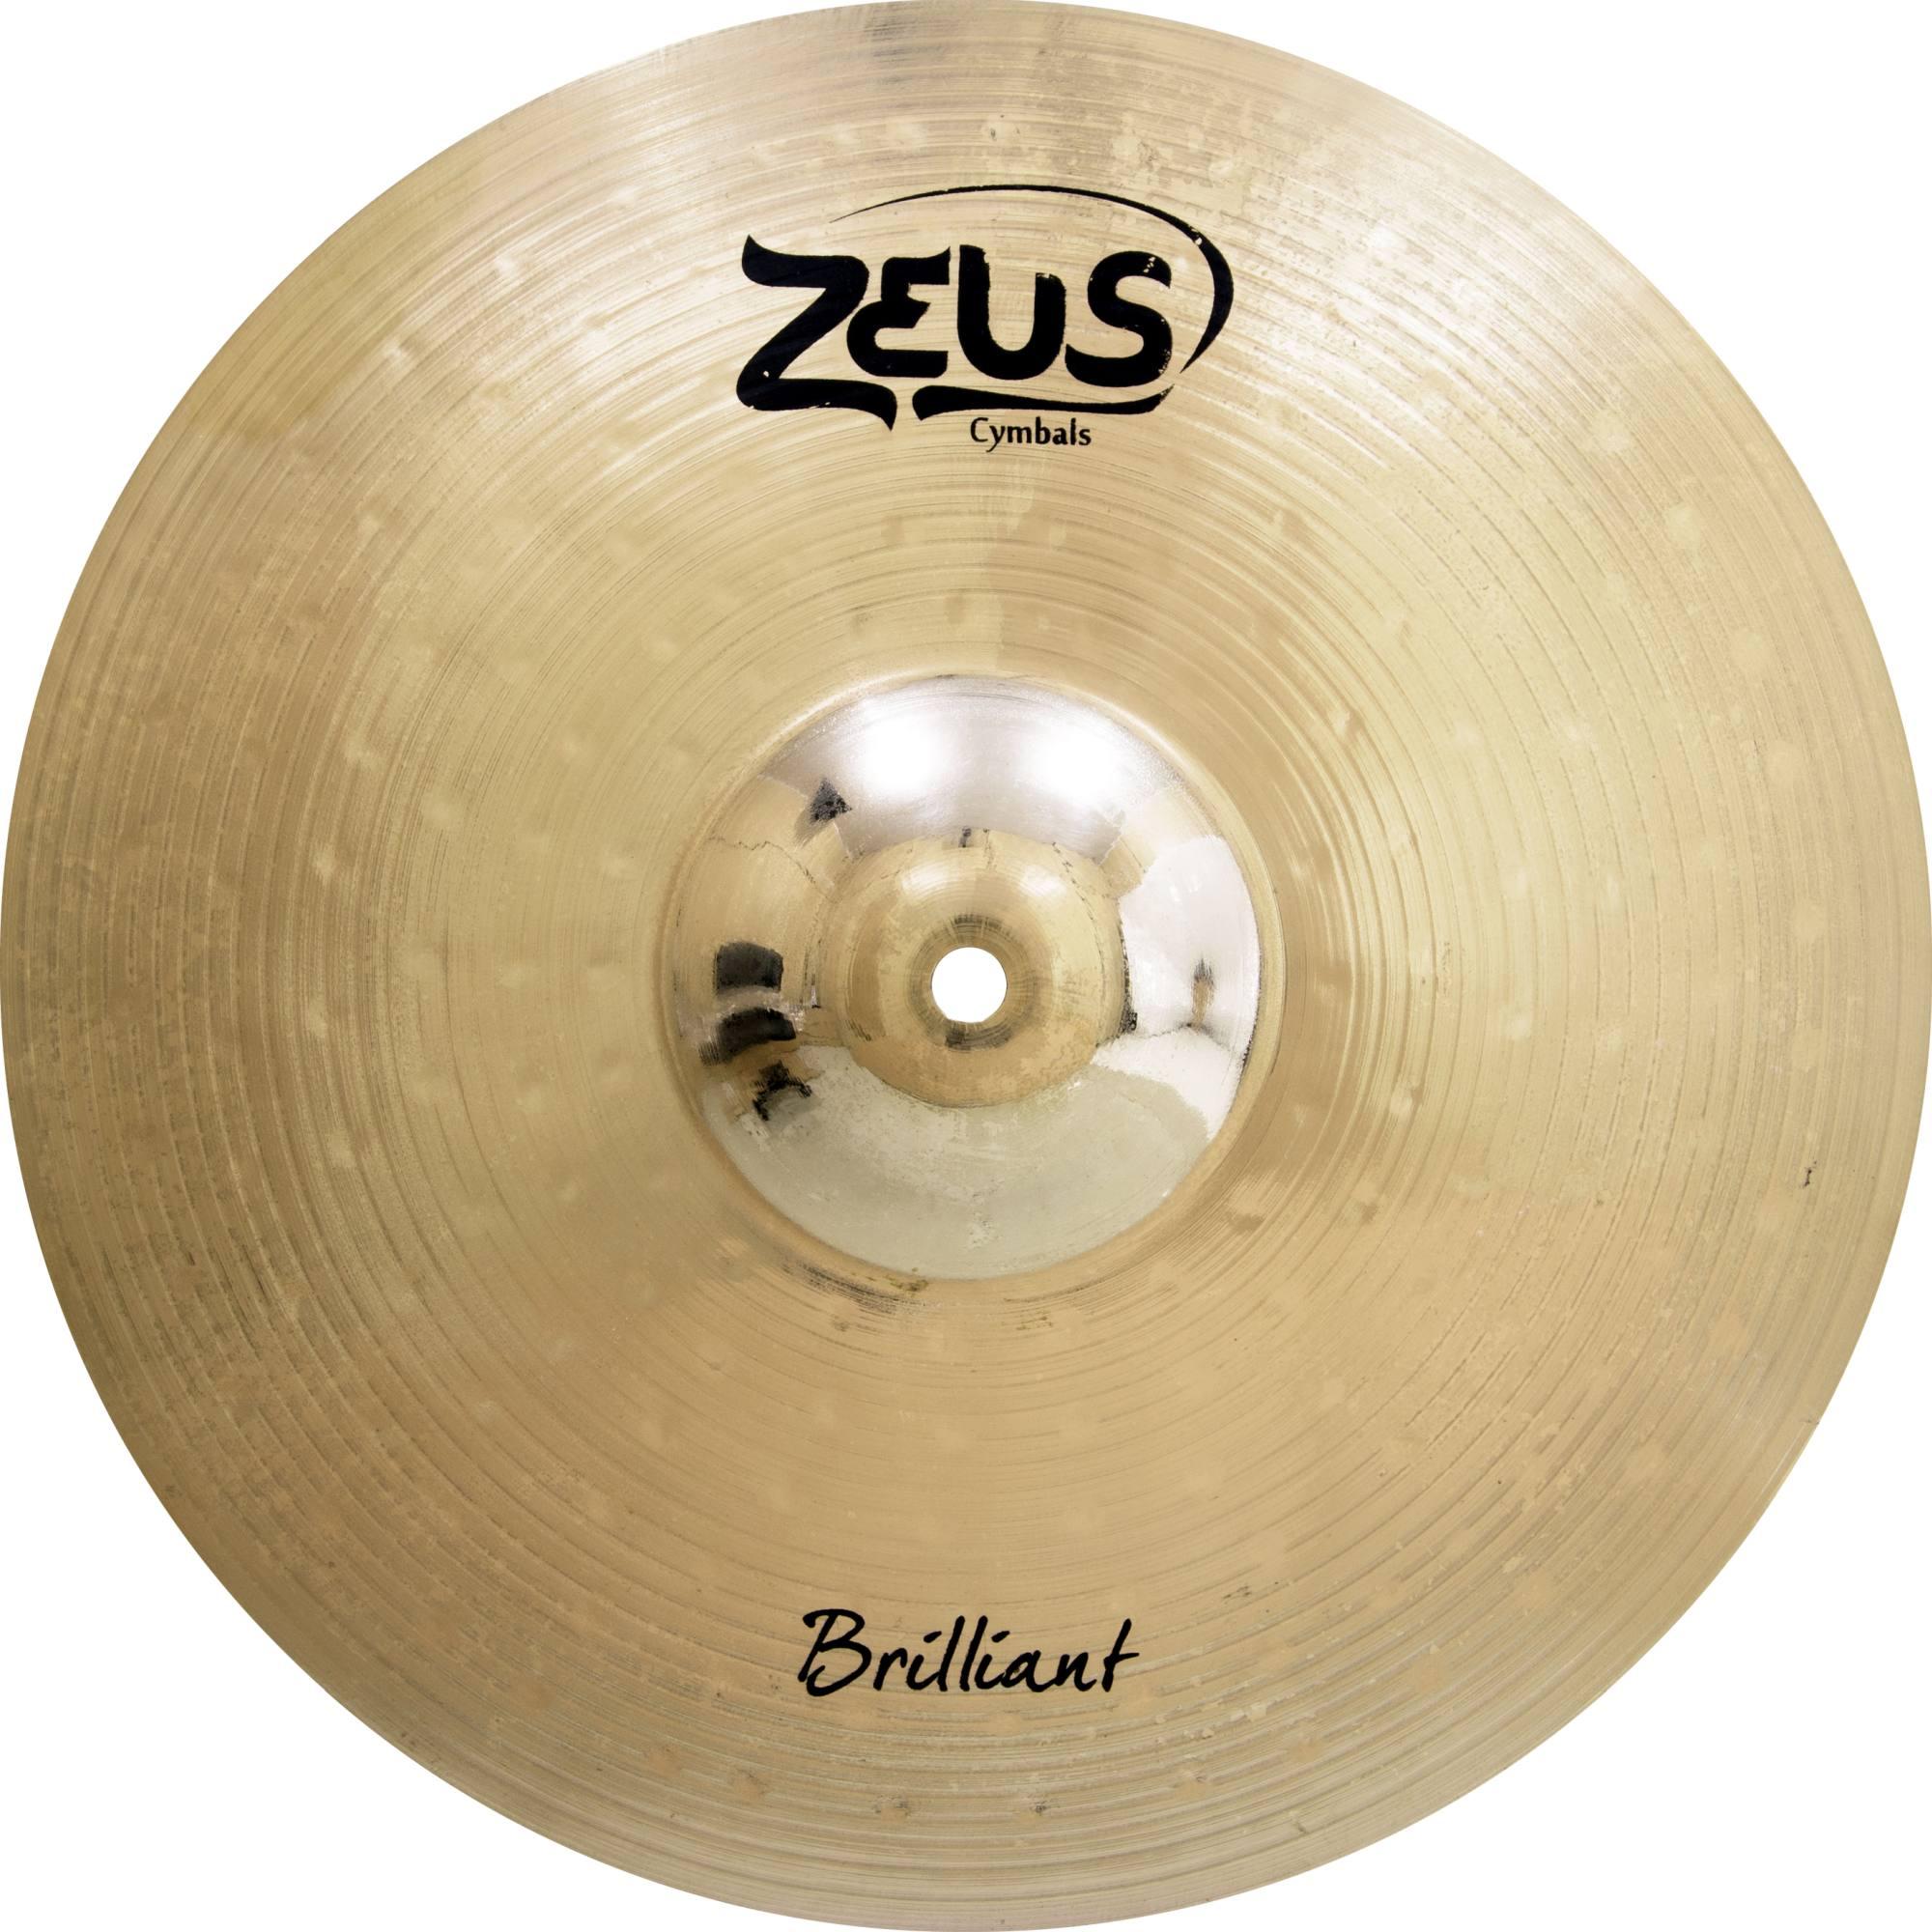 Prato Zeus Brilliant Hi-hat 14 (par) Zbhh14